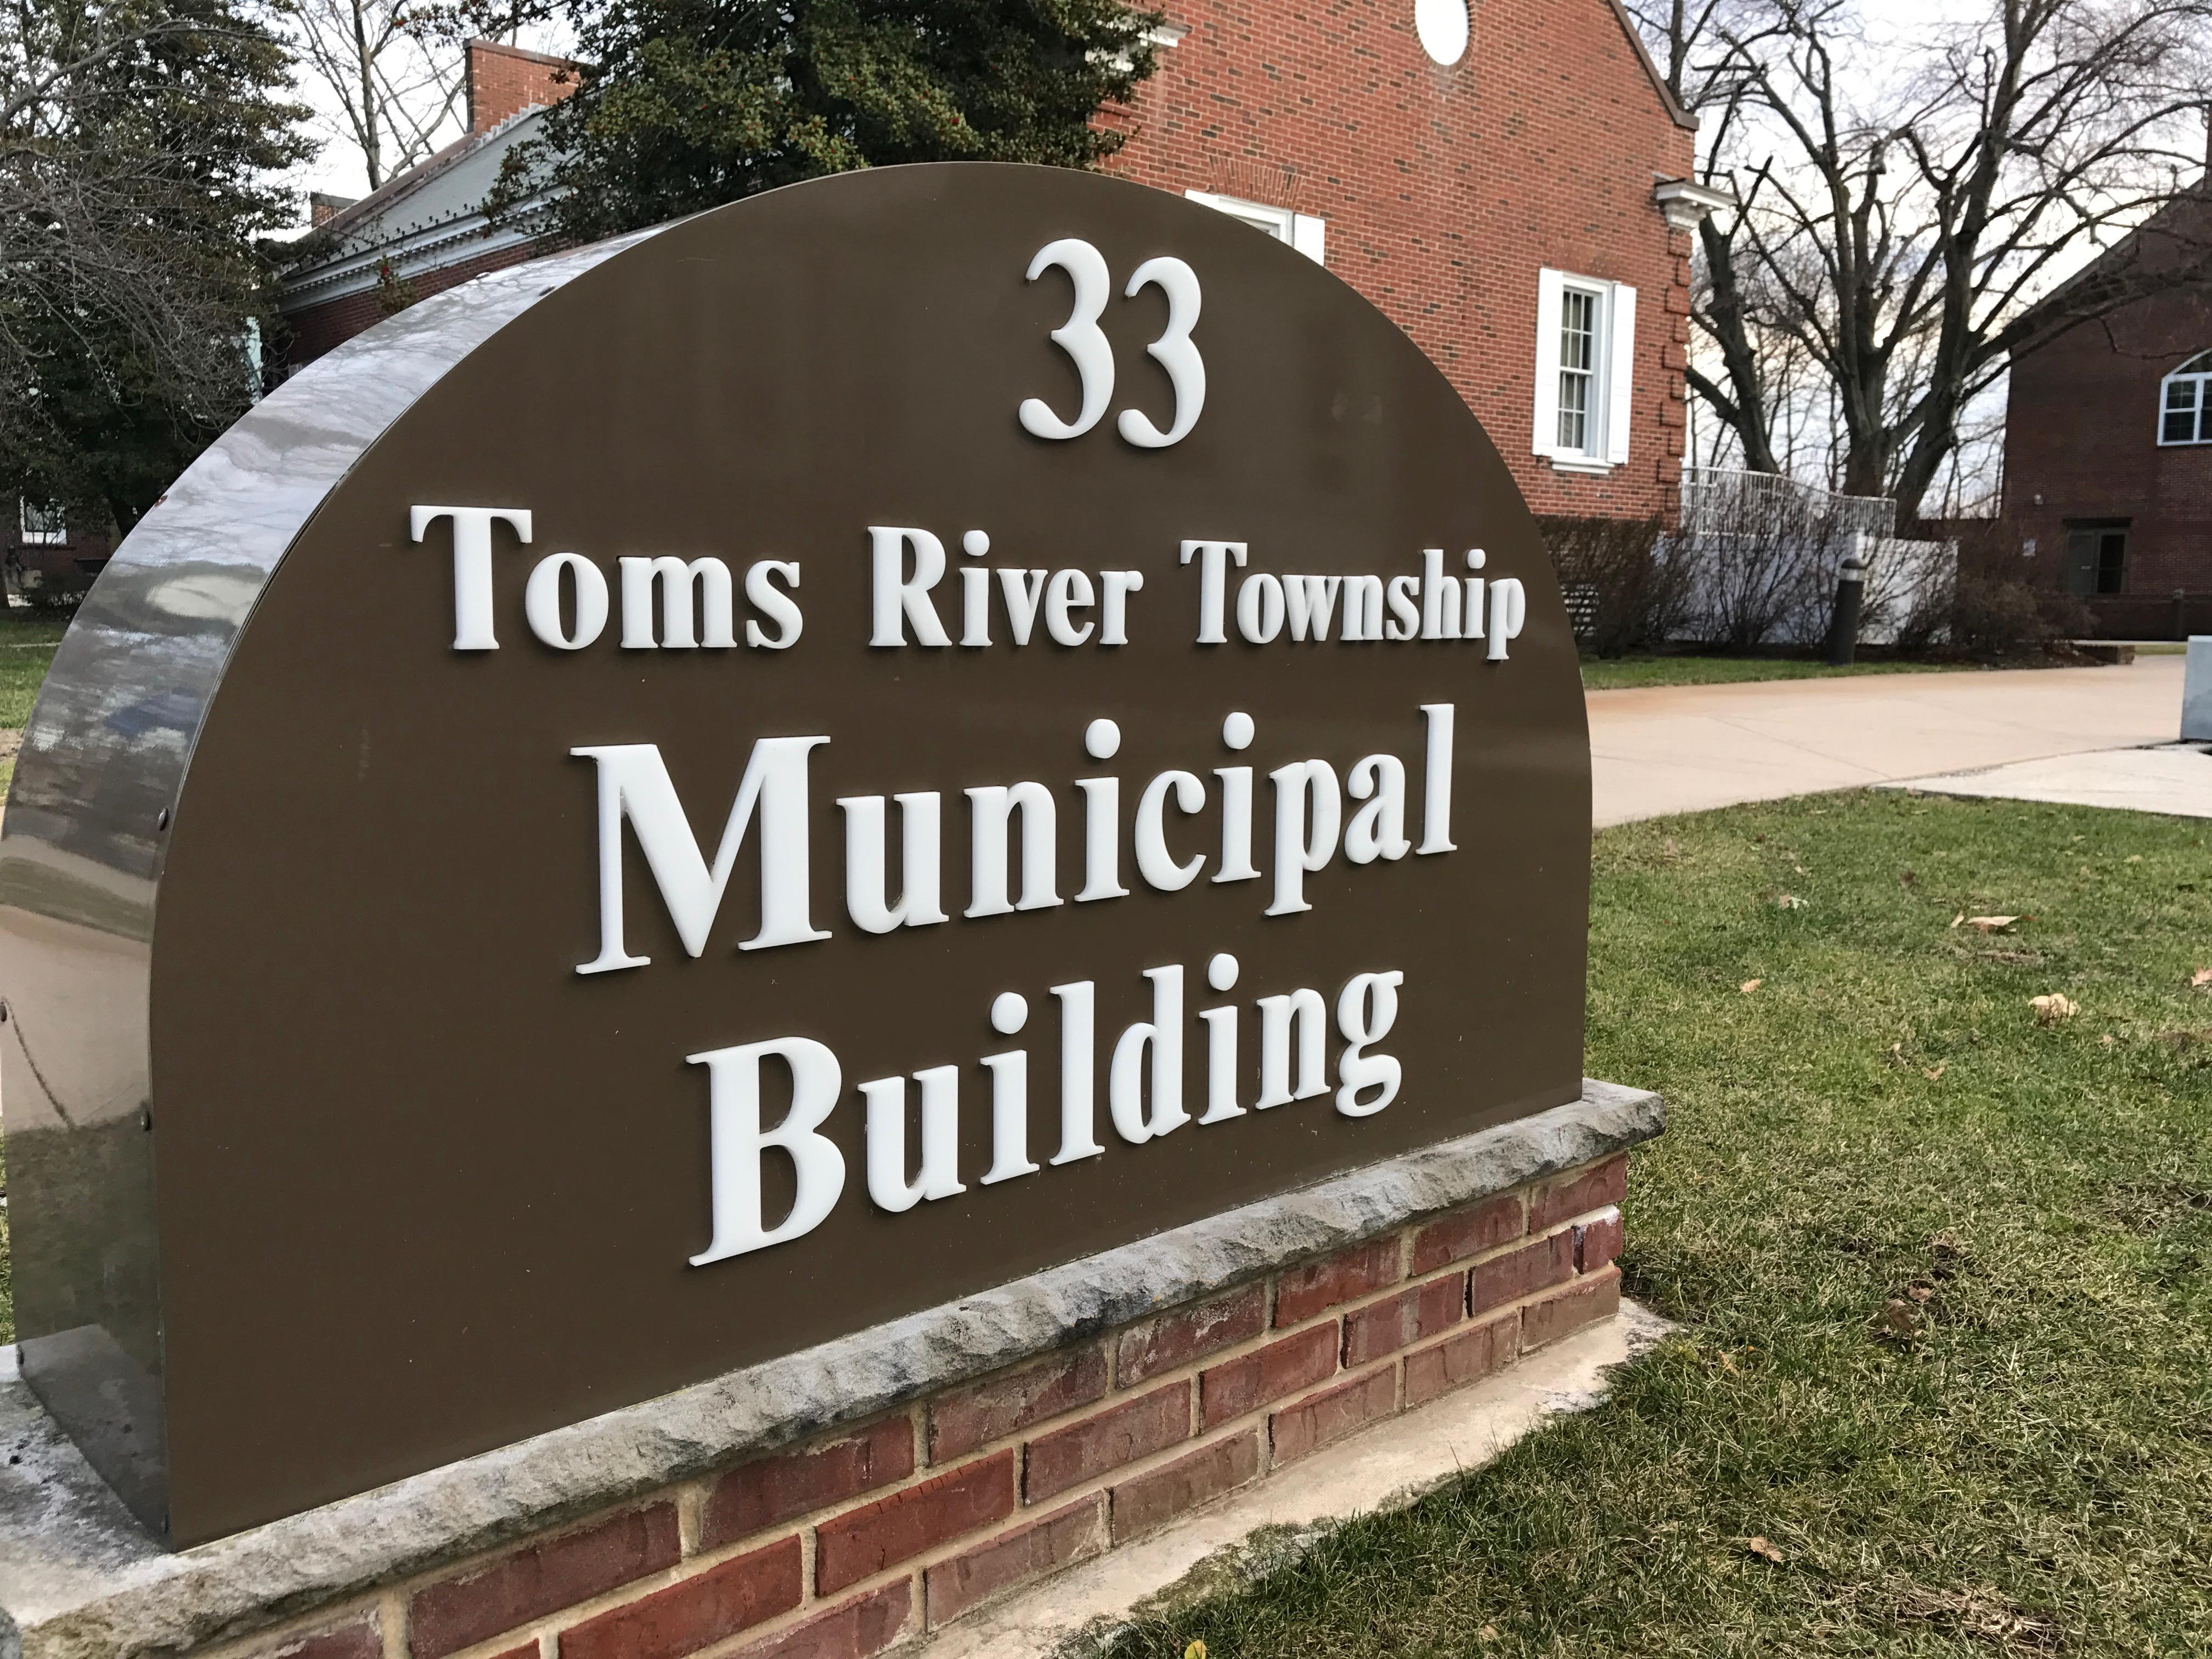 Toms River municipal building. (Photo: Daniel Nee)